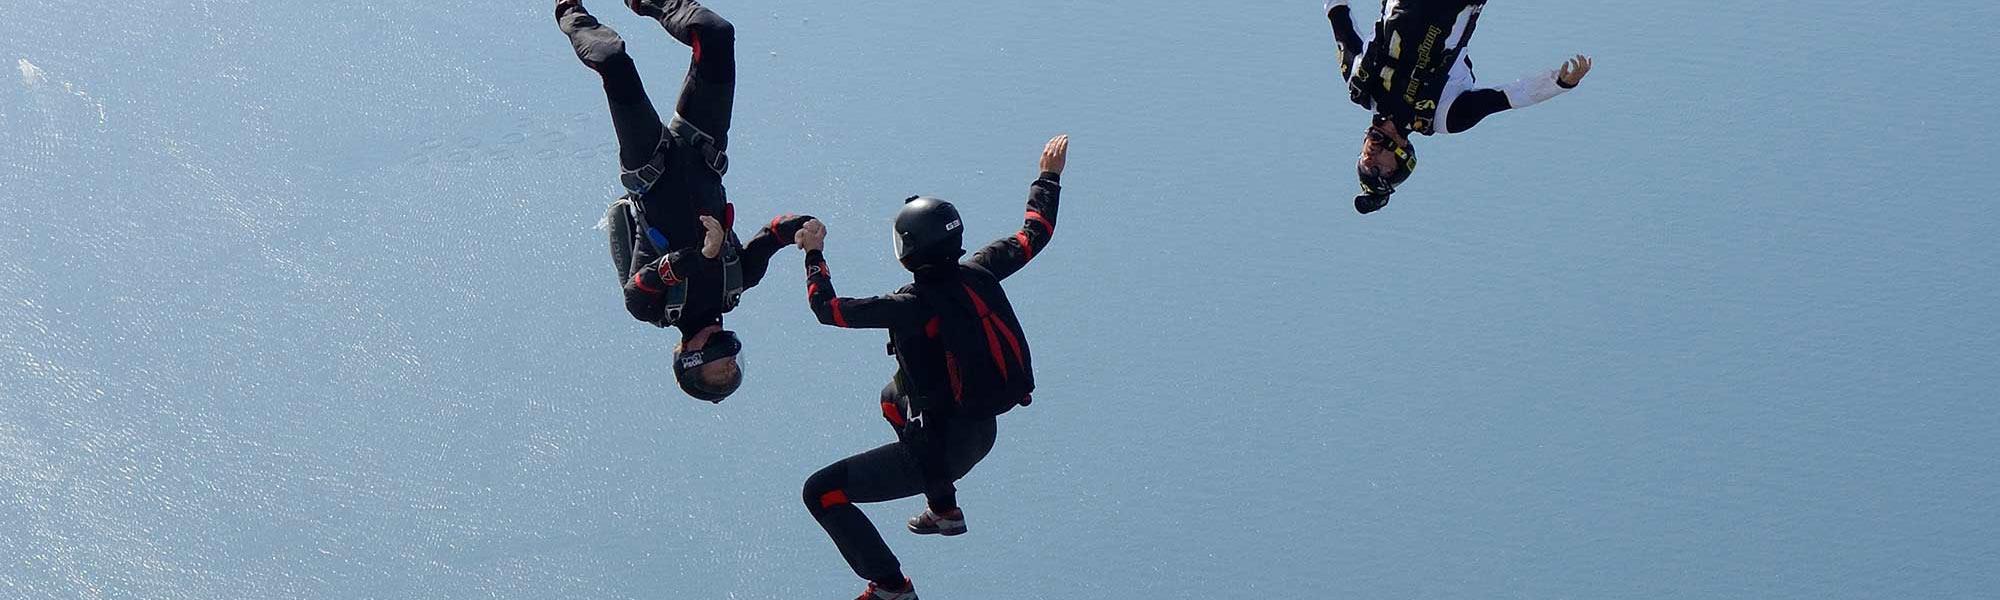 AE team nonstandard.aero © guscabana.com